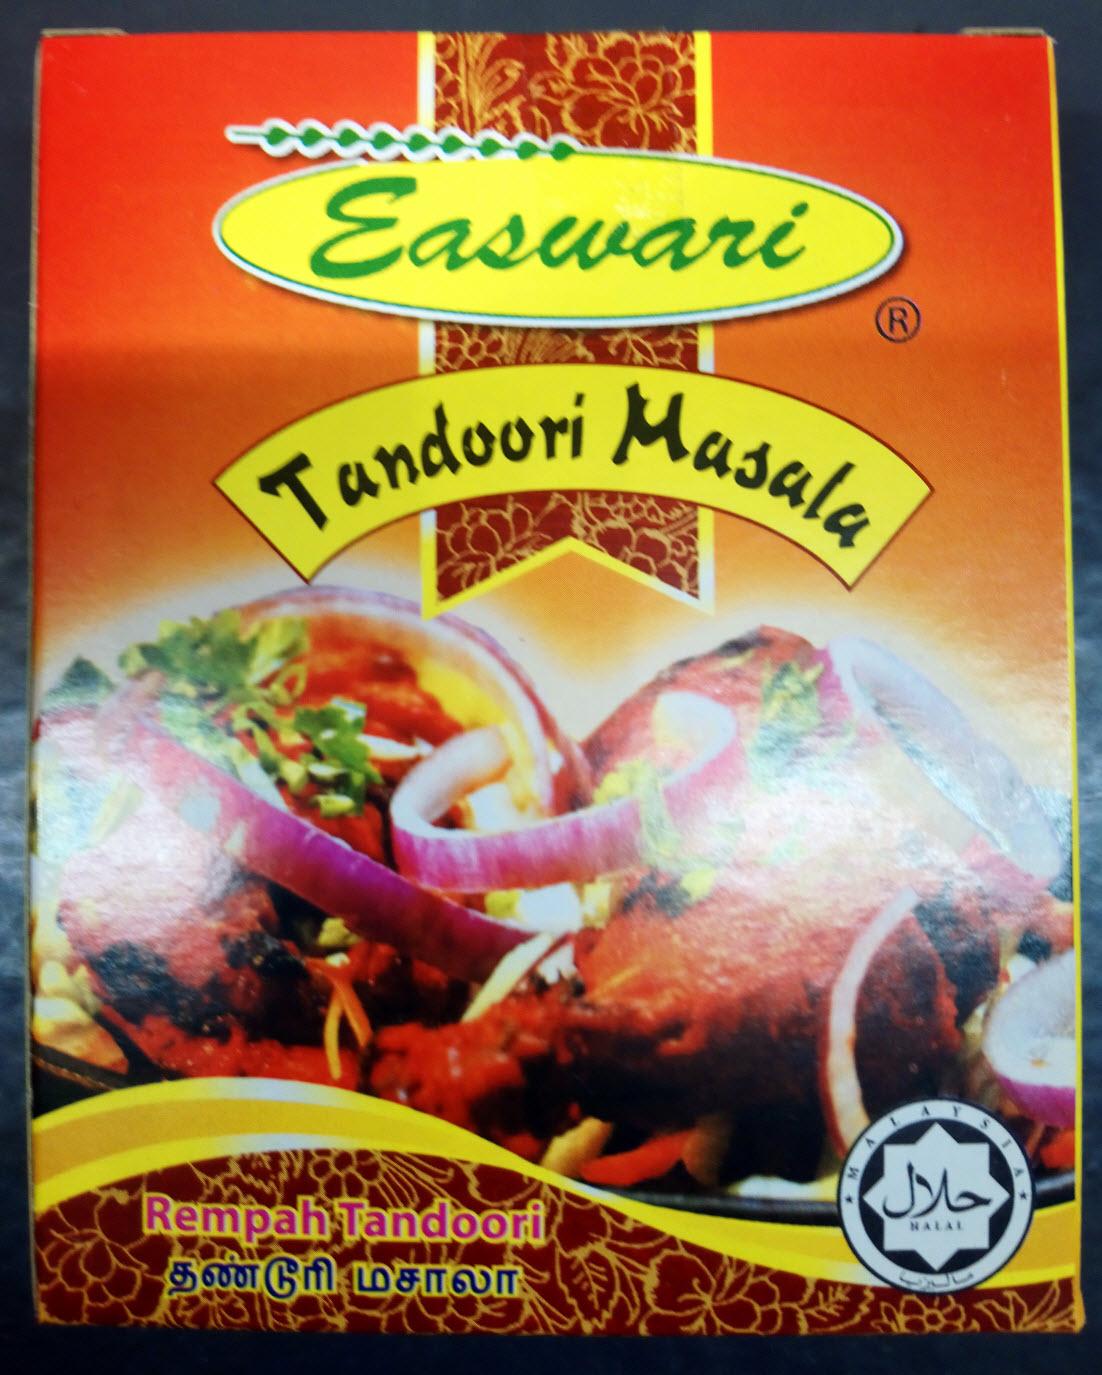 Easwari Tandoori Masala Rempah Spice 50g